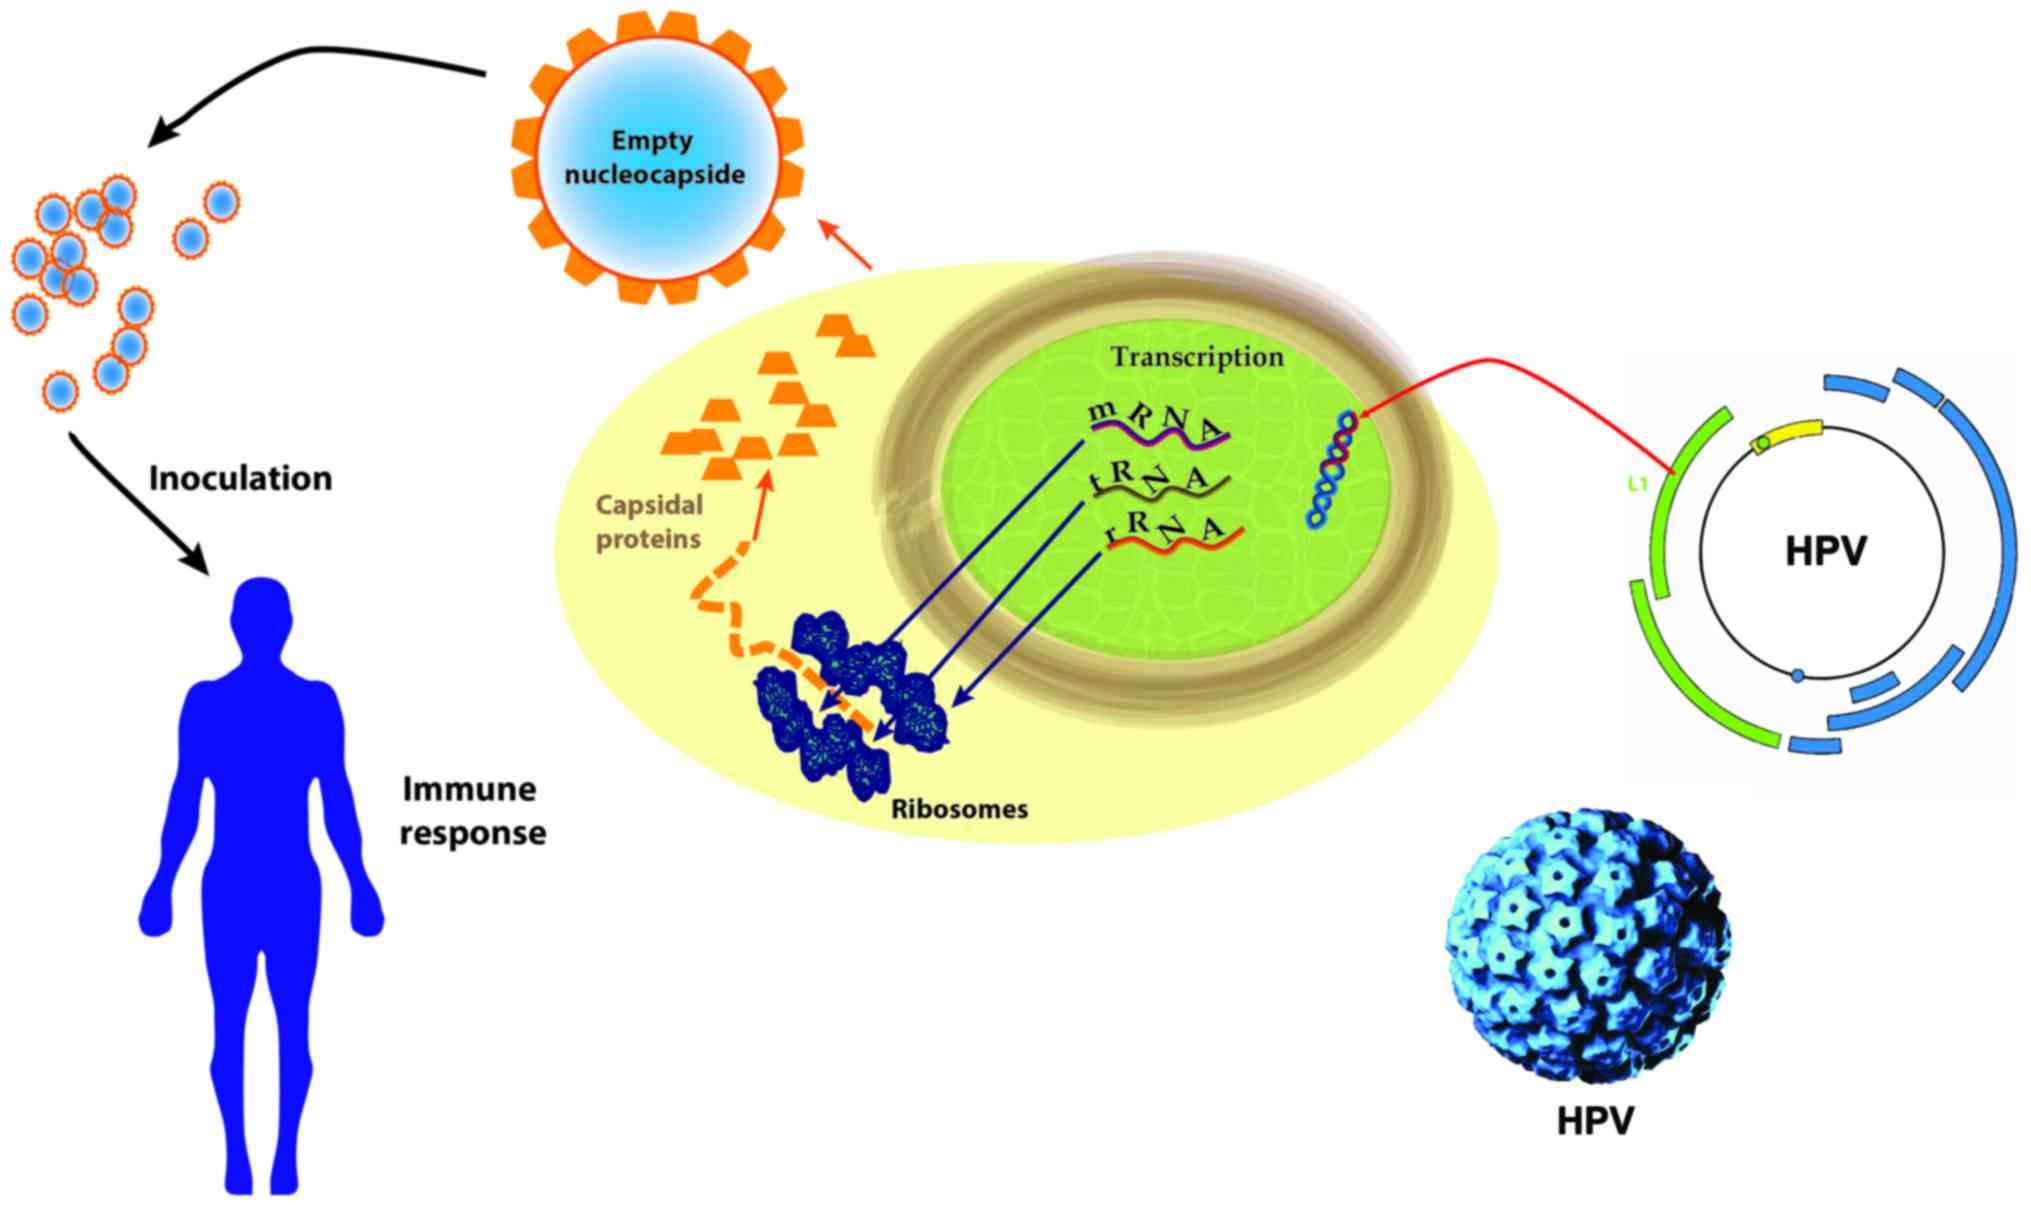 hpv and cancer mechanism viermii sunt cele mai bune medicamente